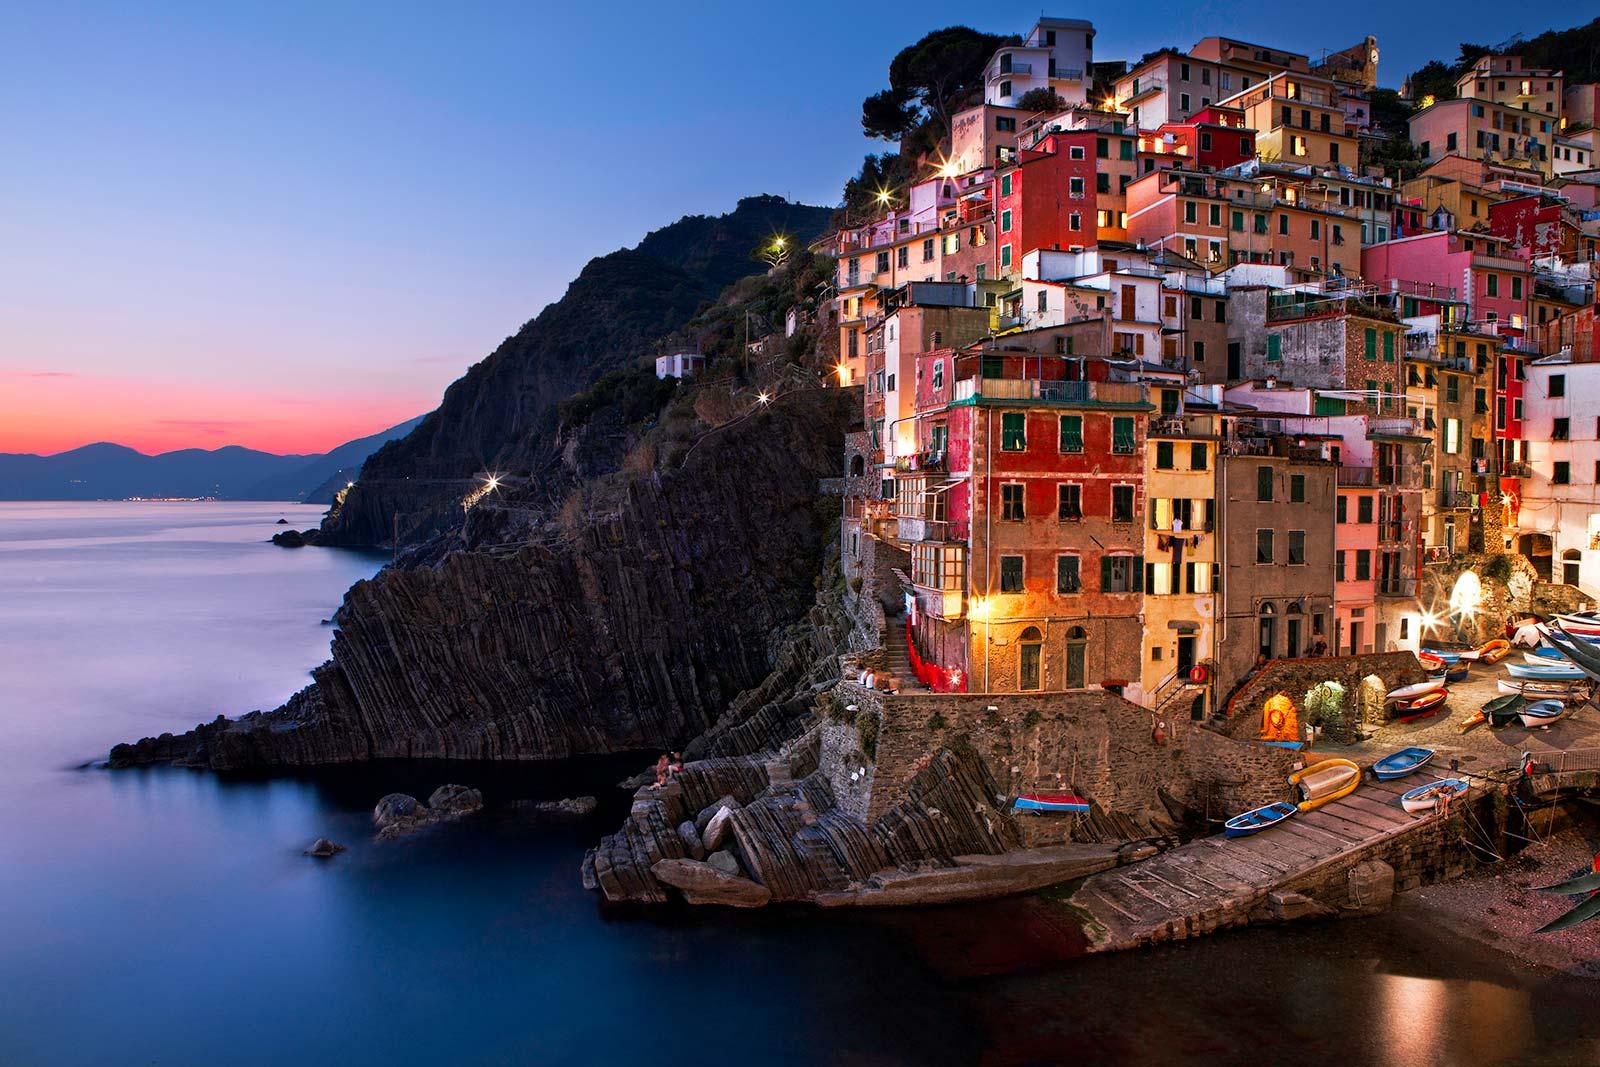 Riomaggiore Cinque Terre Italy at Dusk | James Brandon Photographer